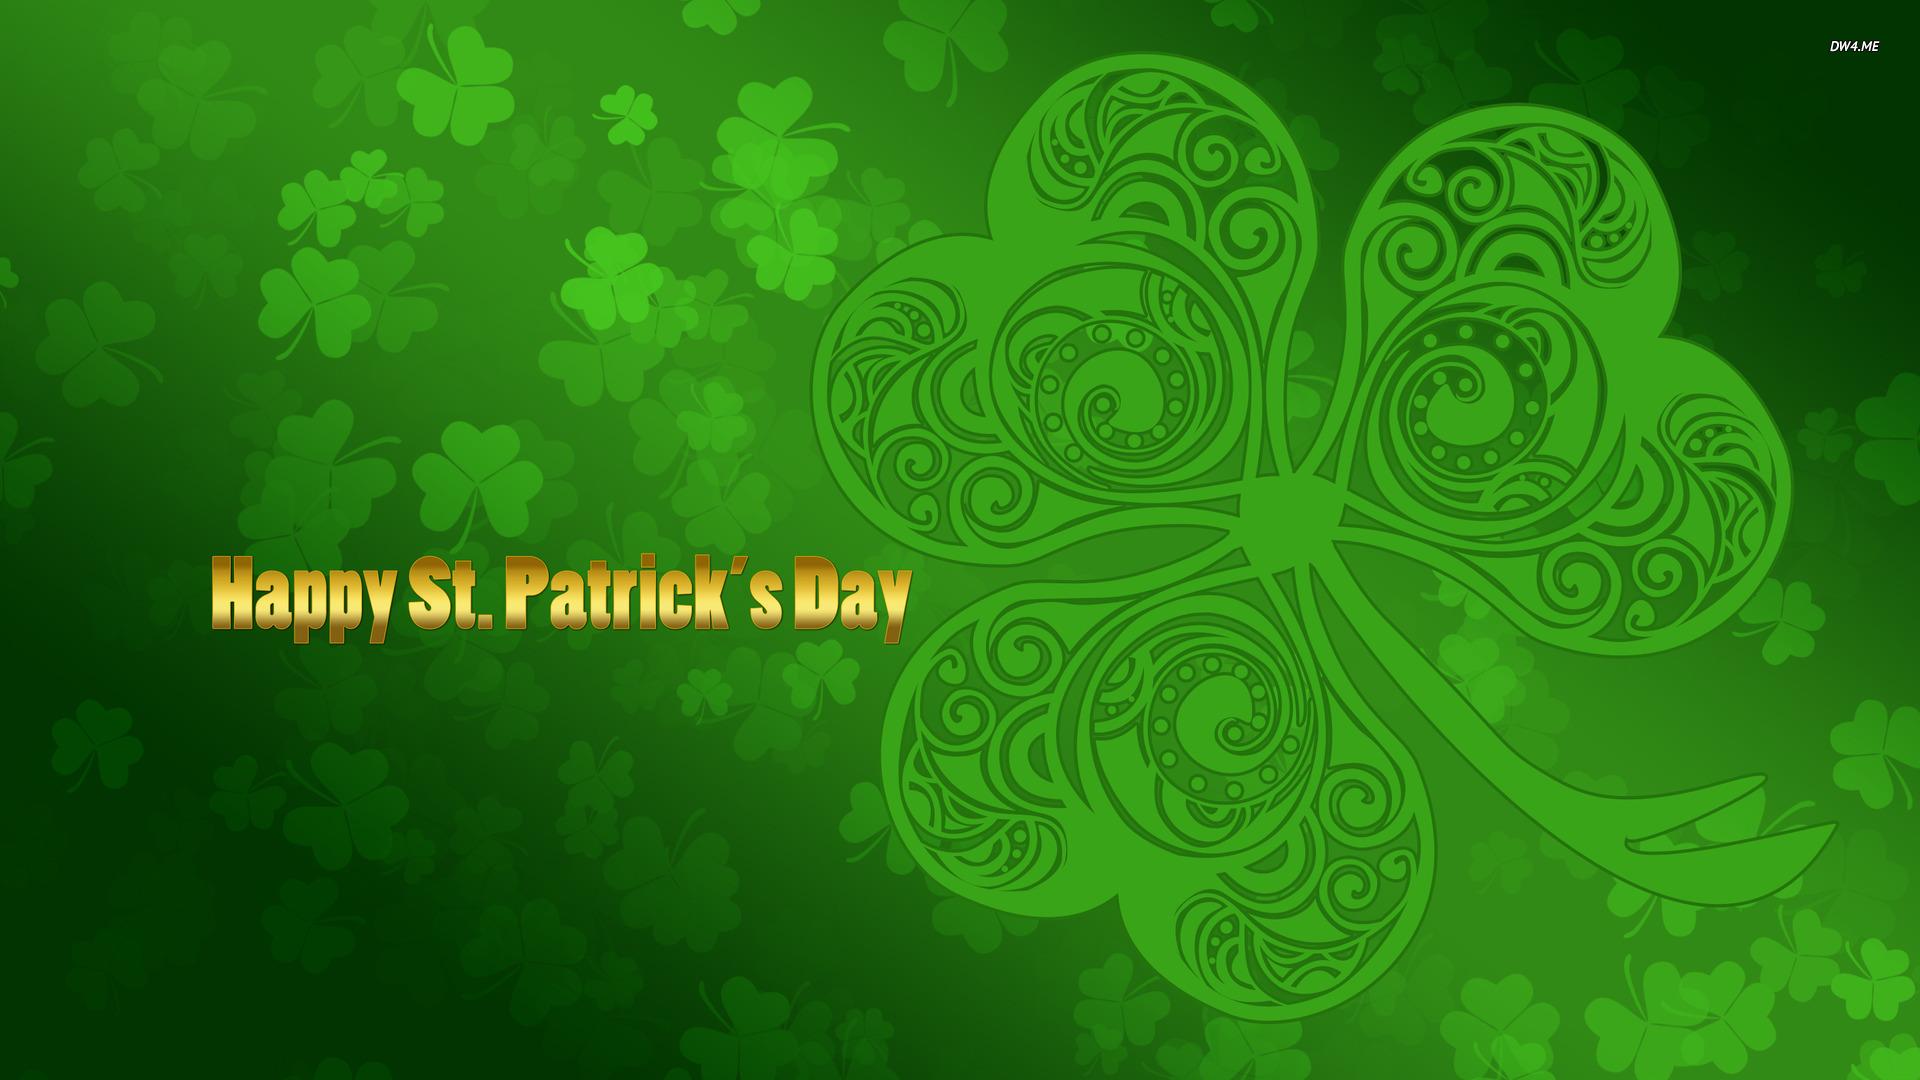 Happy Saint Patrick's Day wallpaper - Holiday wallpapers ...